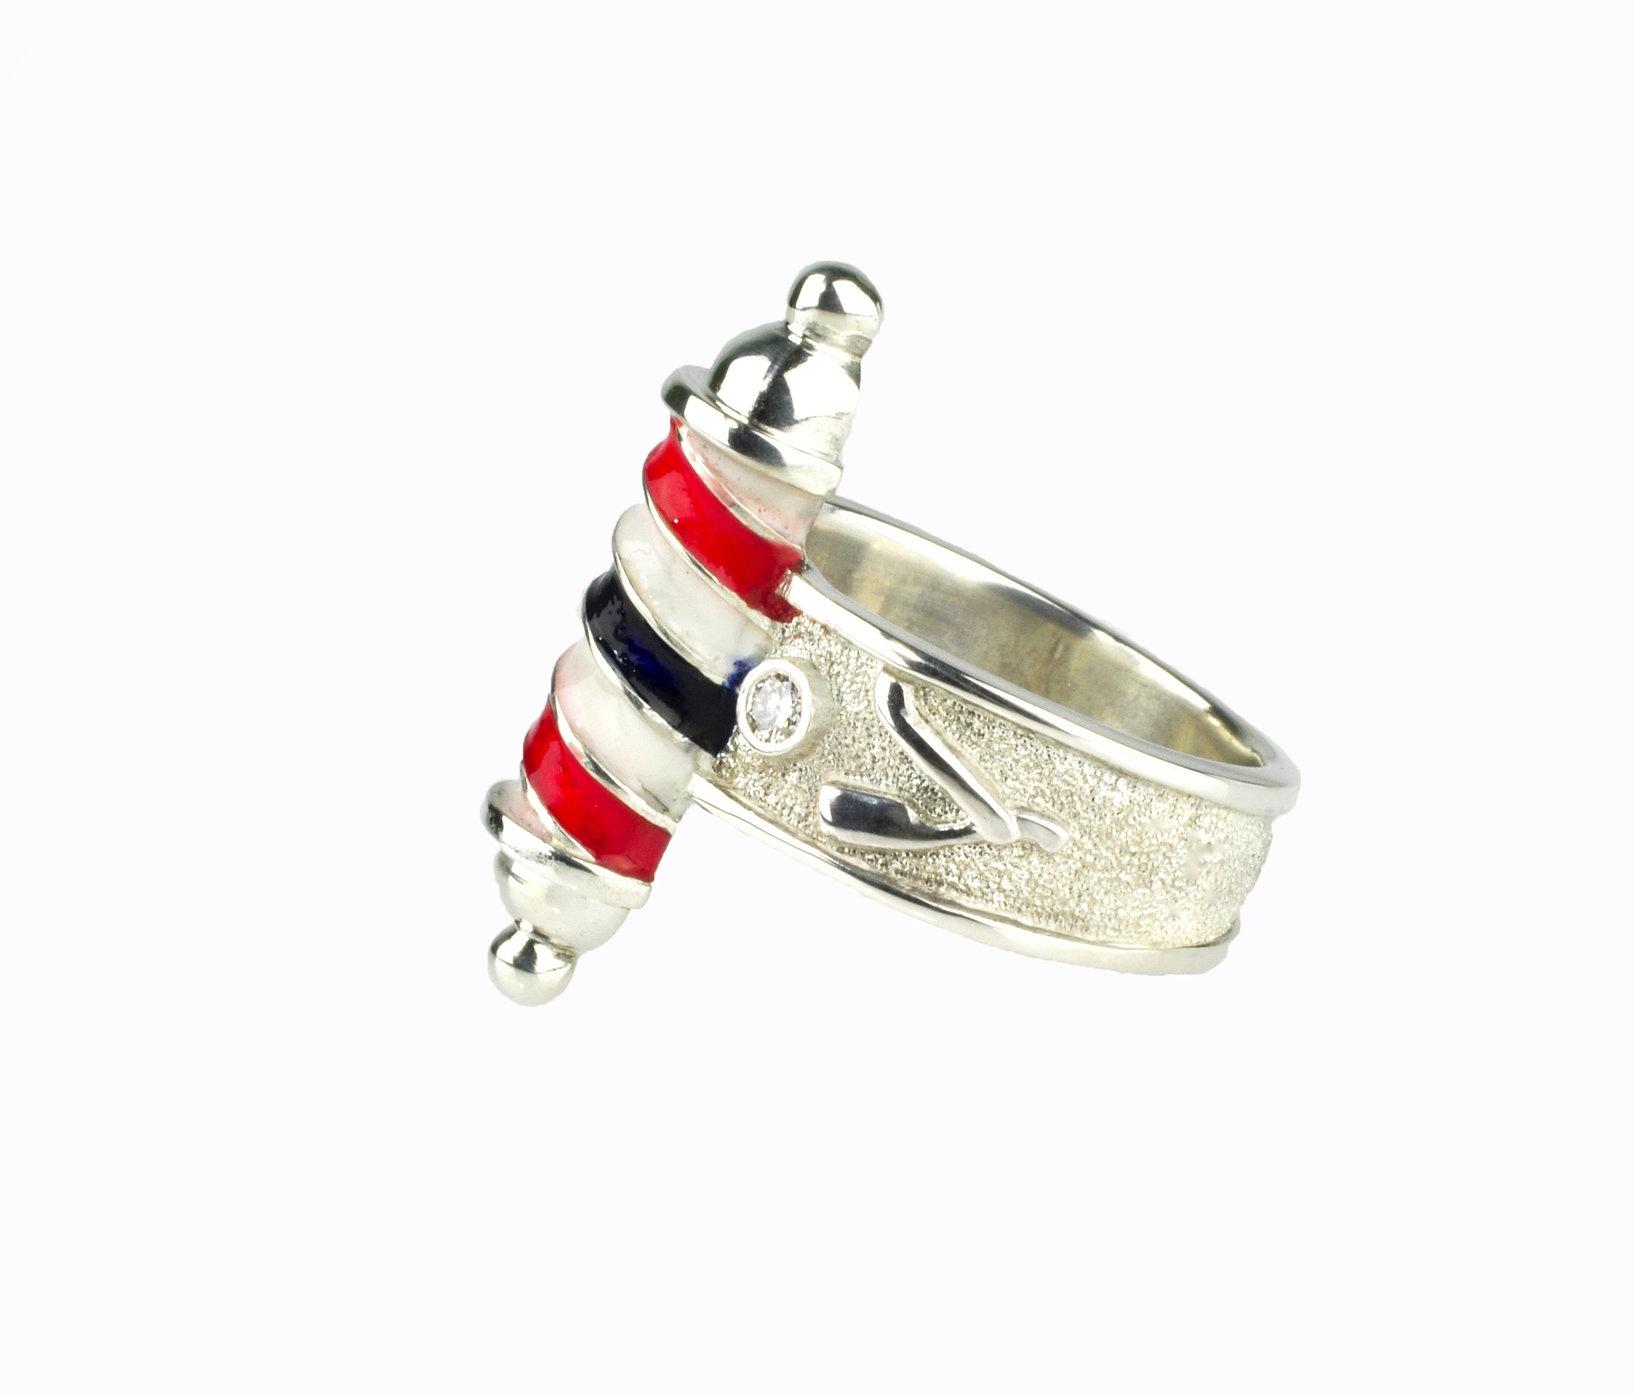 Barber Pole Ring with Enamel and Diamonds by Waylon Rhoads Jewelry